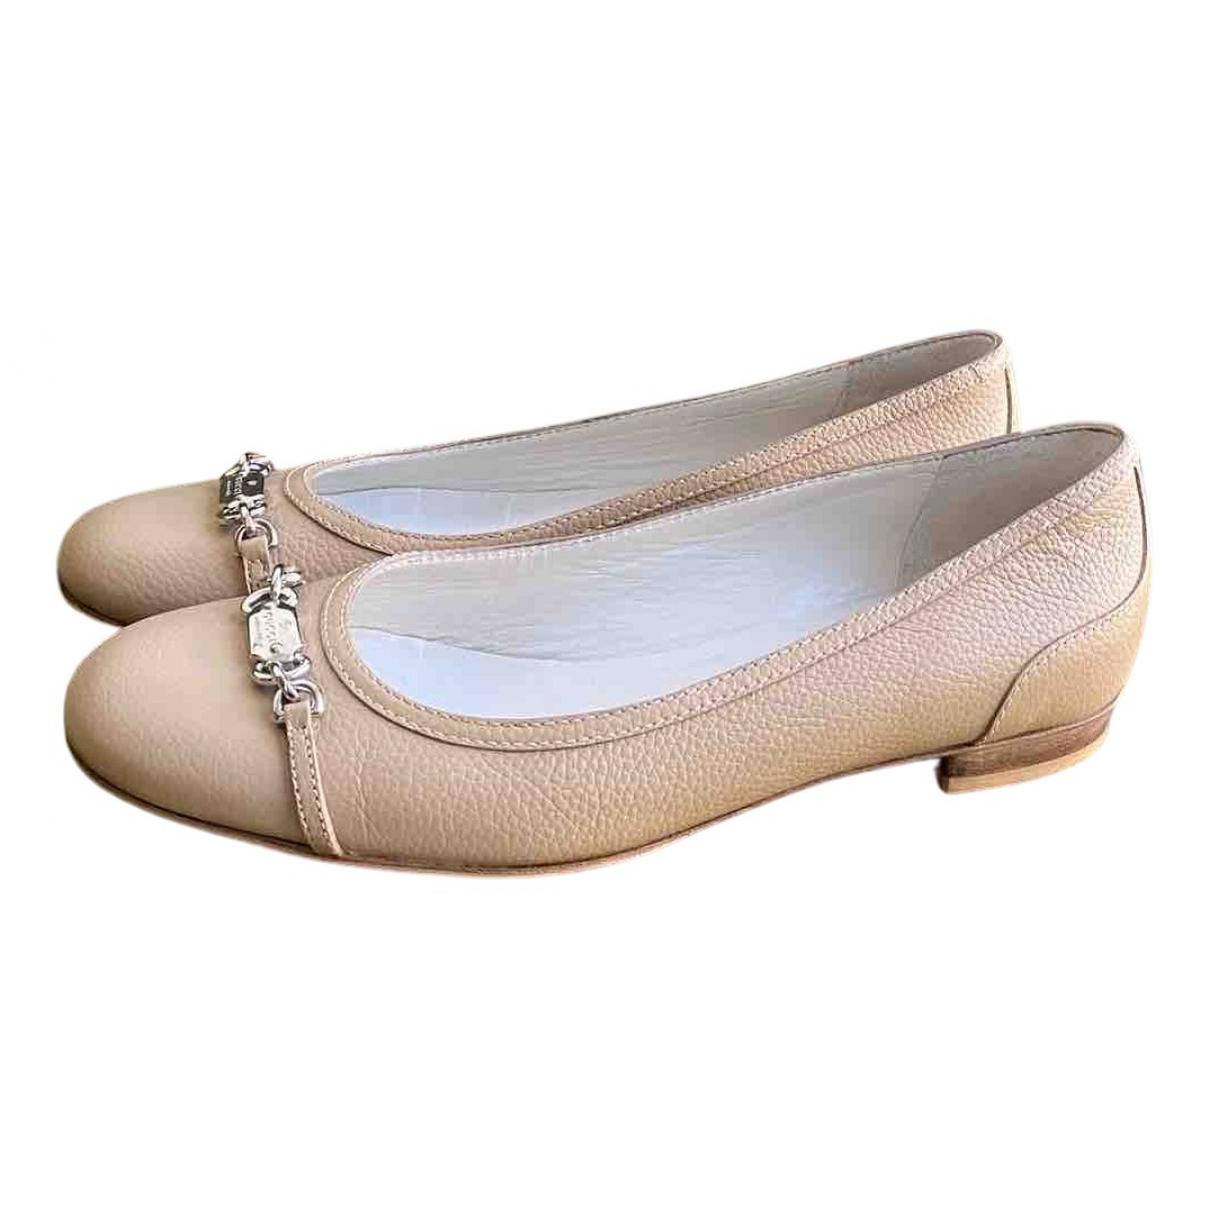 Gucci \N Ballerinas in  Beige Leder